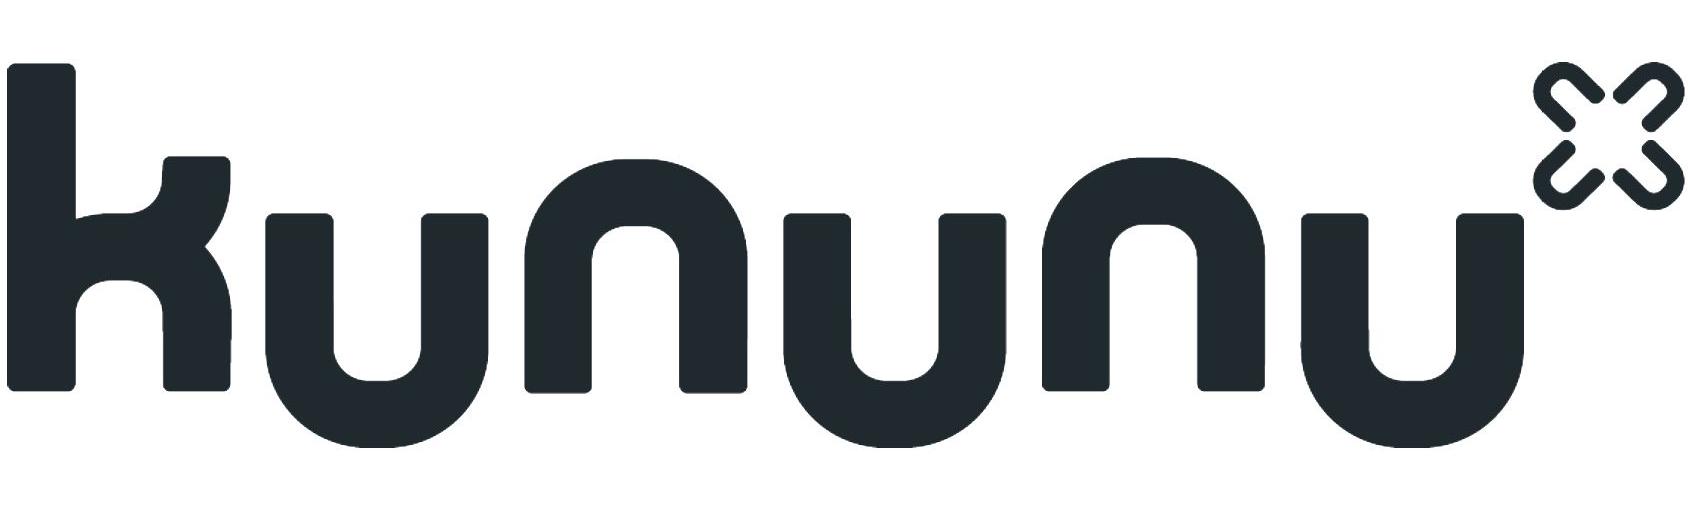 kununu – Pre-screen candidates in 20 instead of 60 minutes